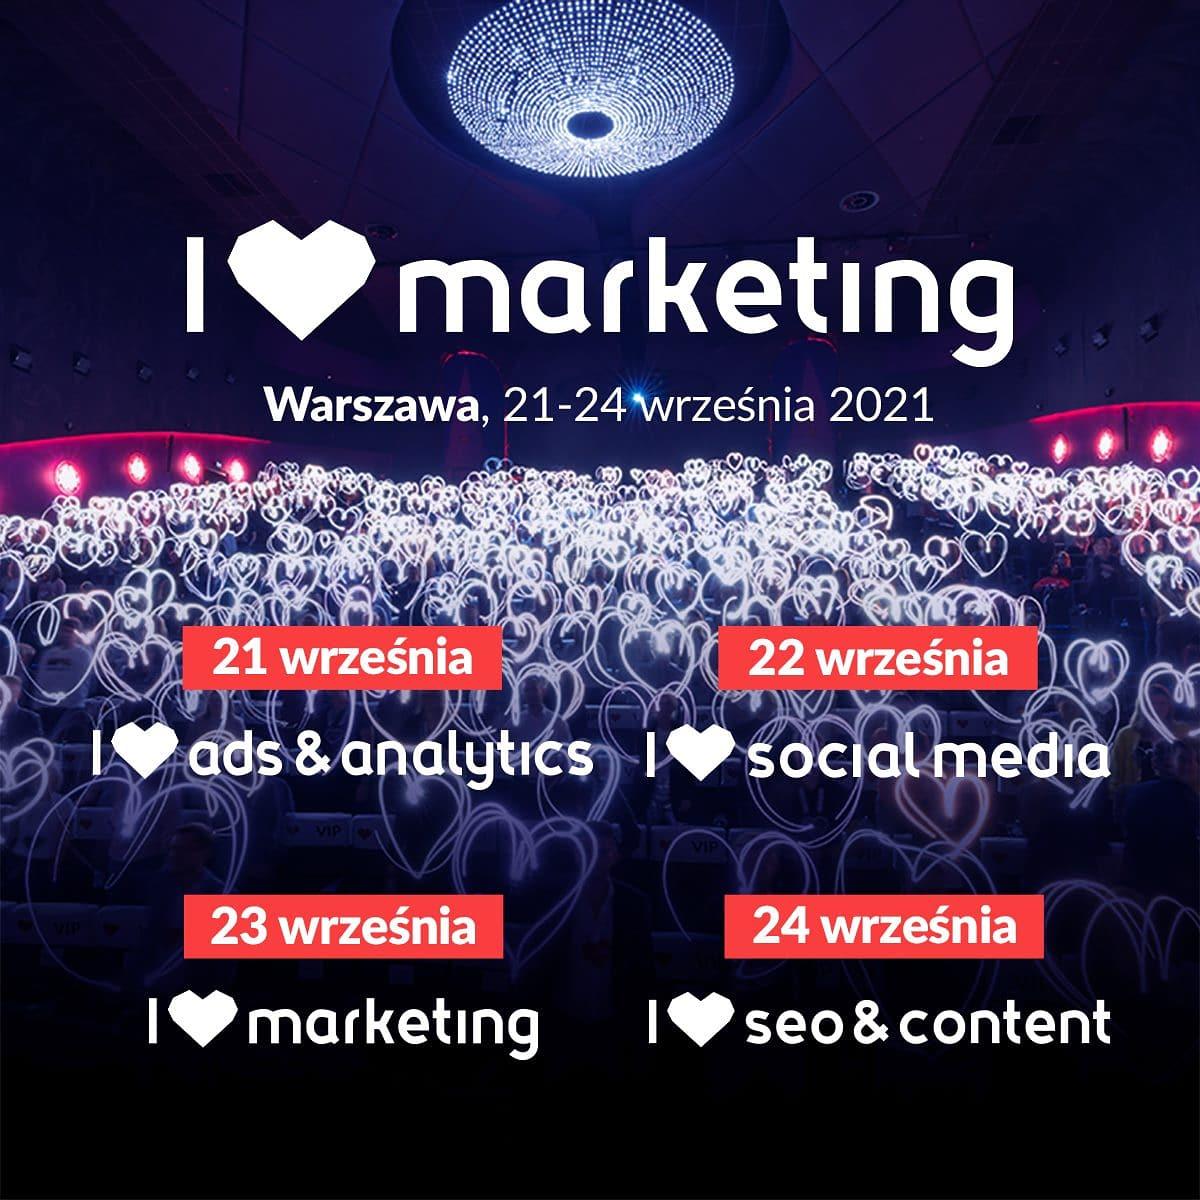 ILovemarketing 21-24.09.2021